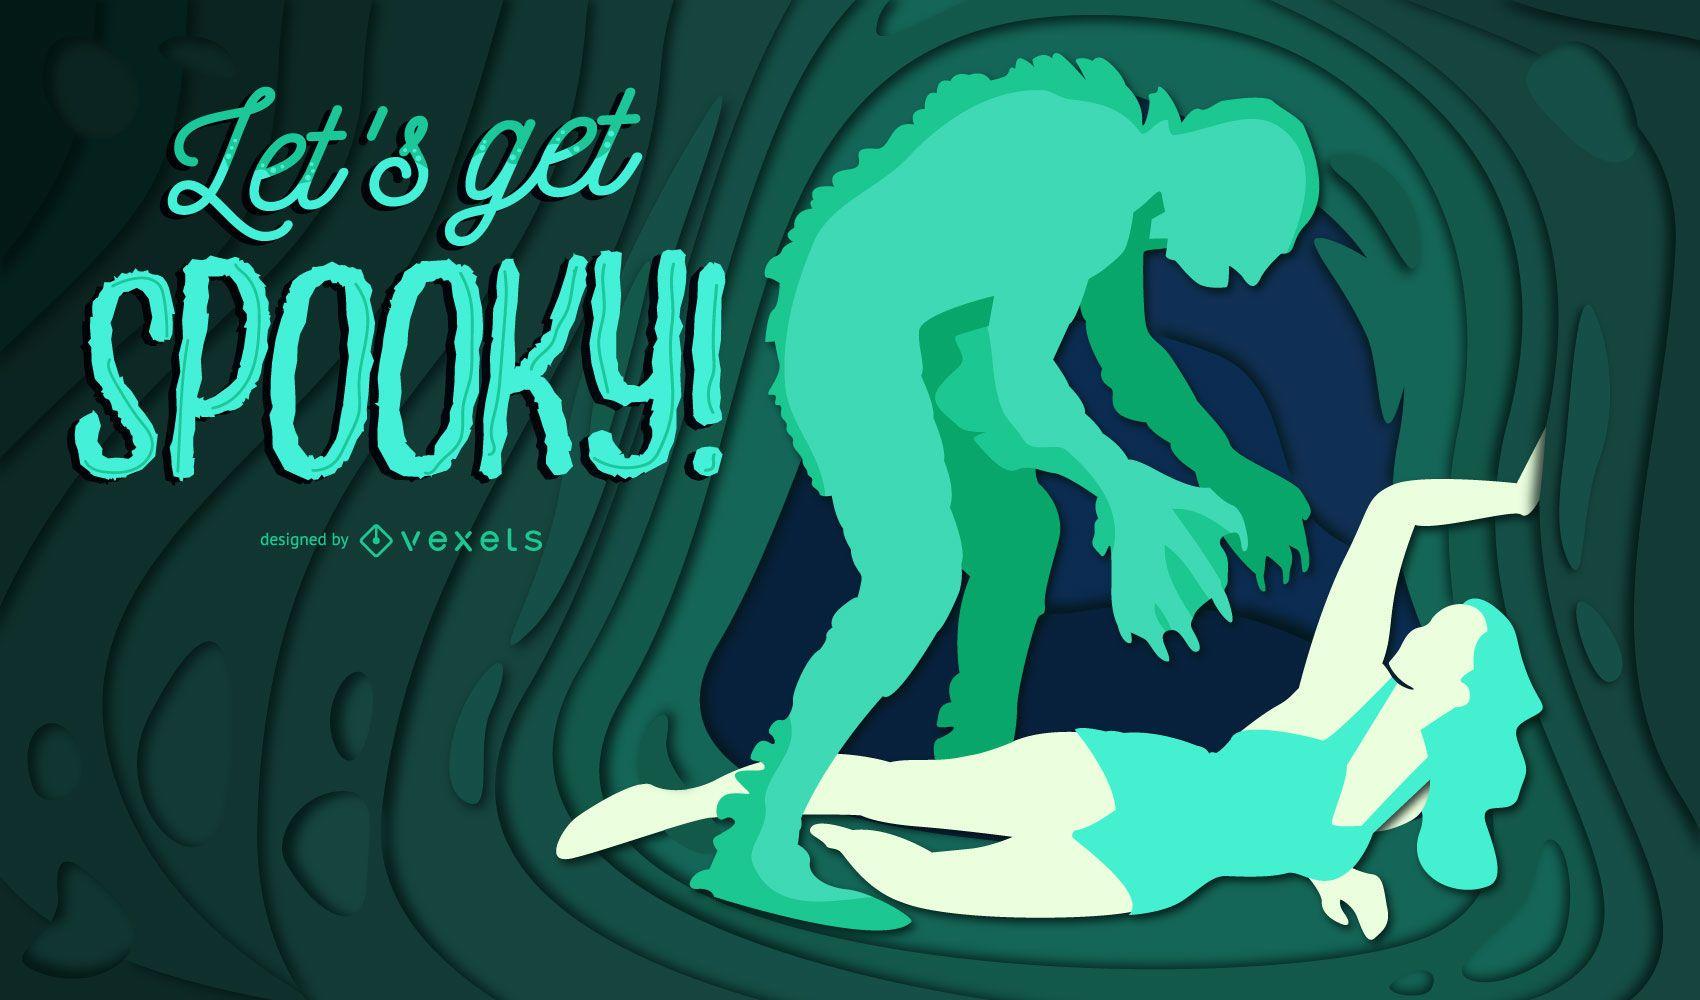 Spooky halloween papercut illustration